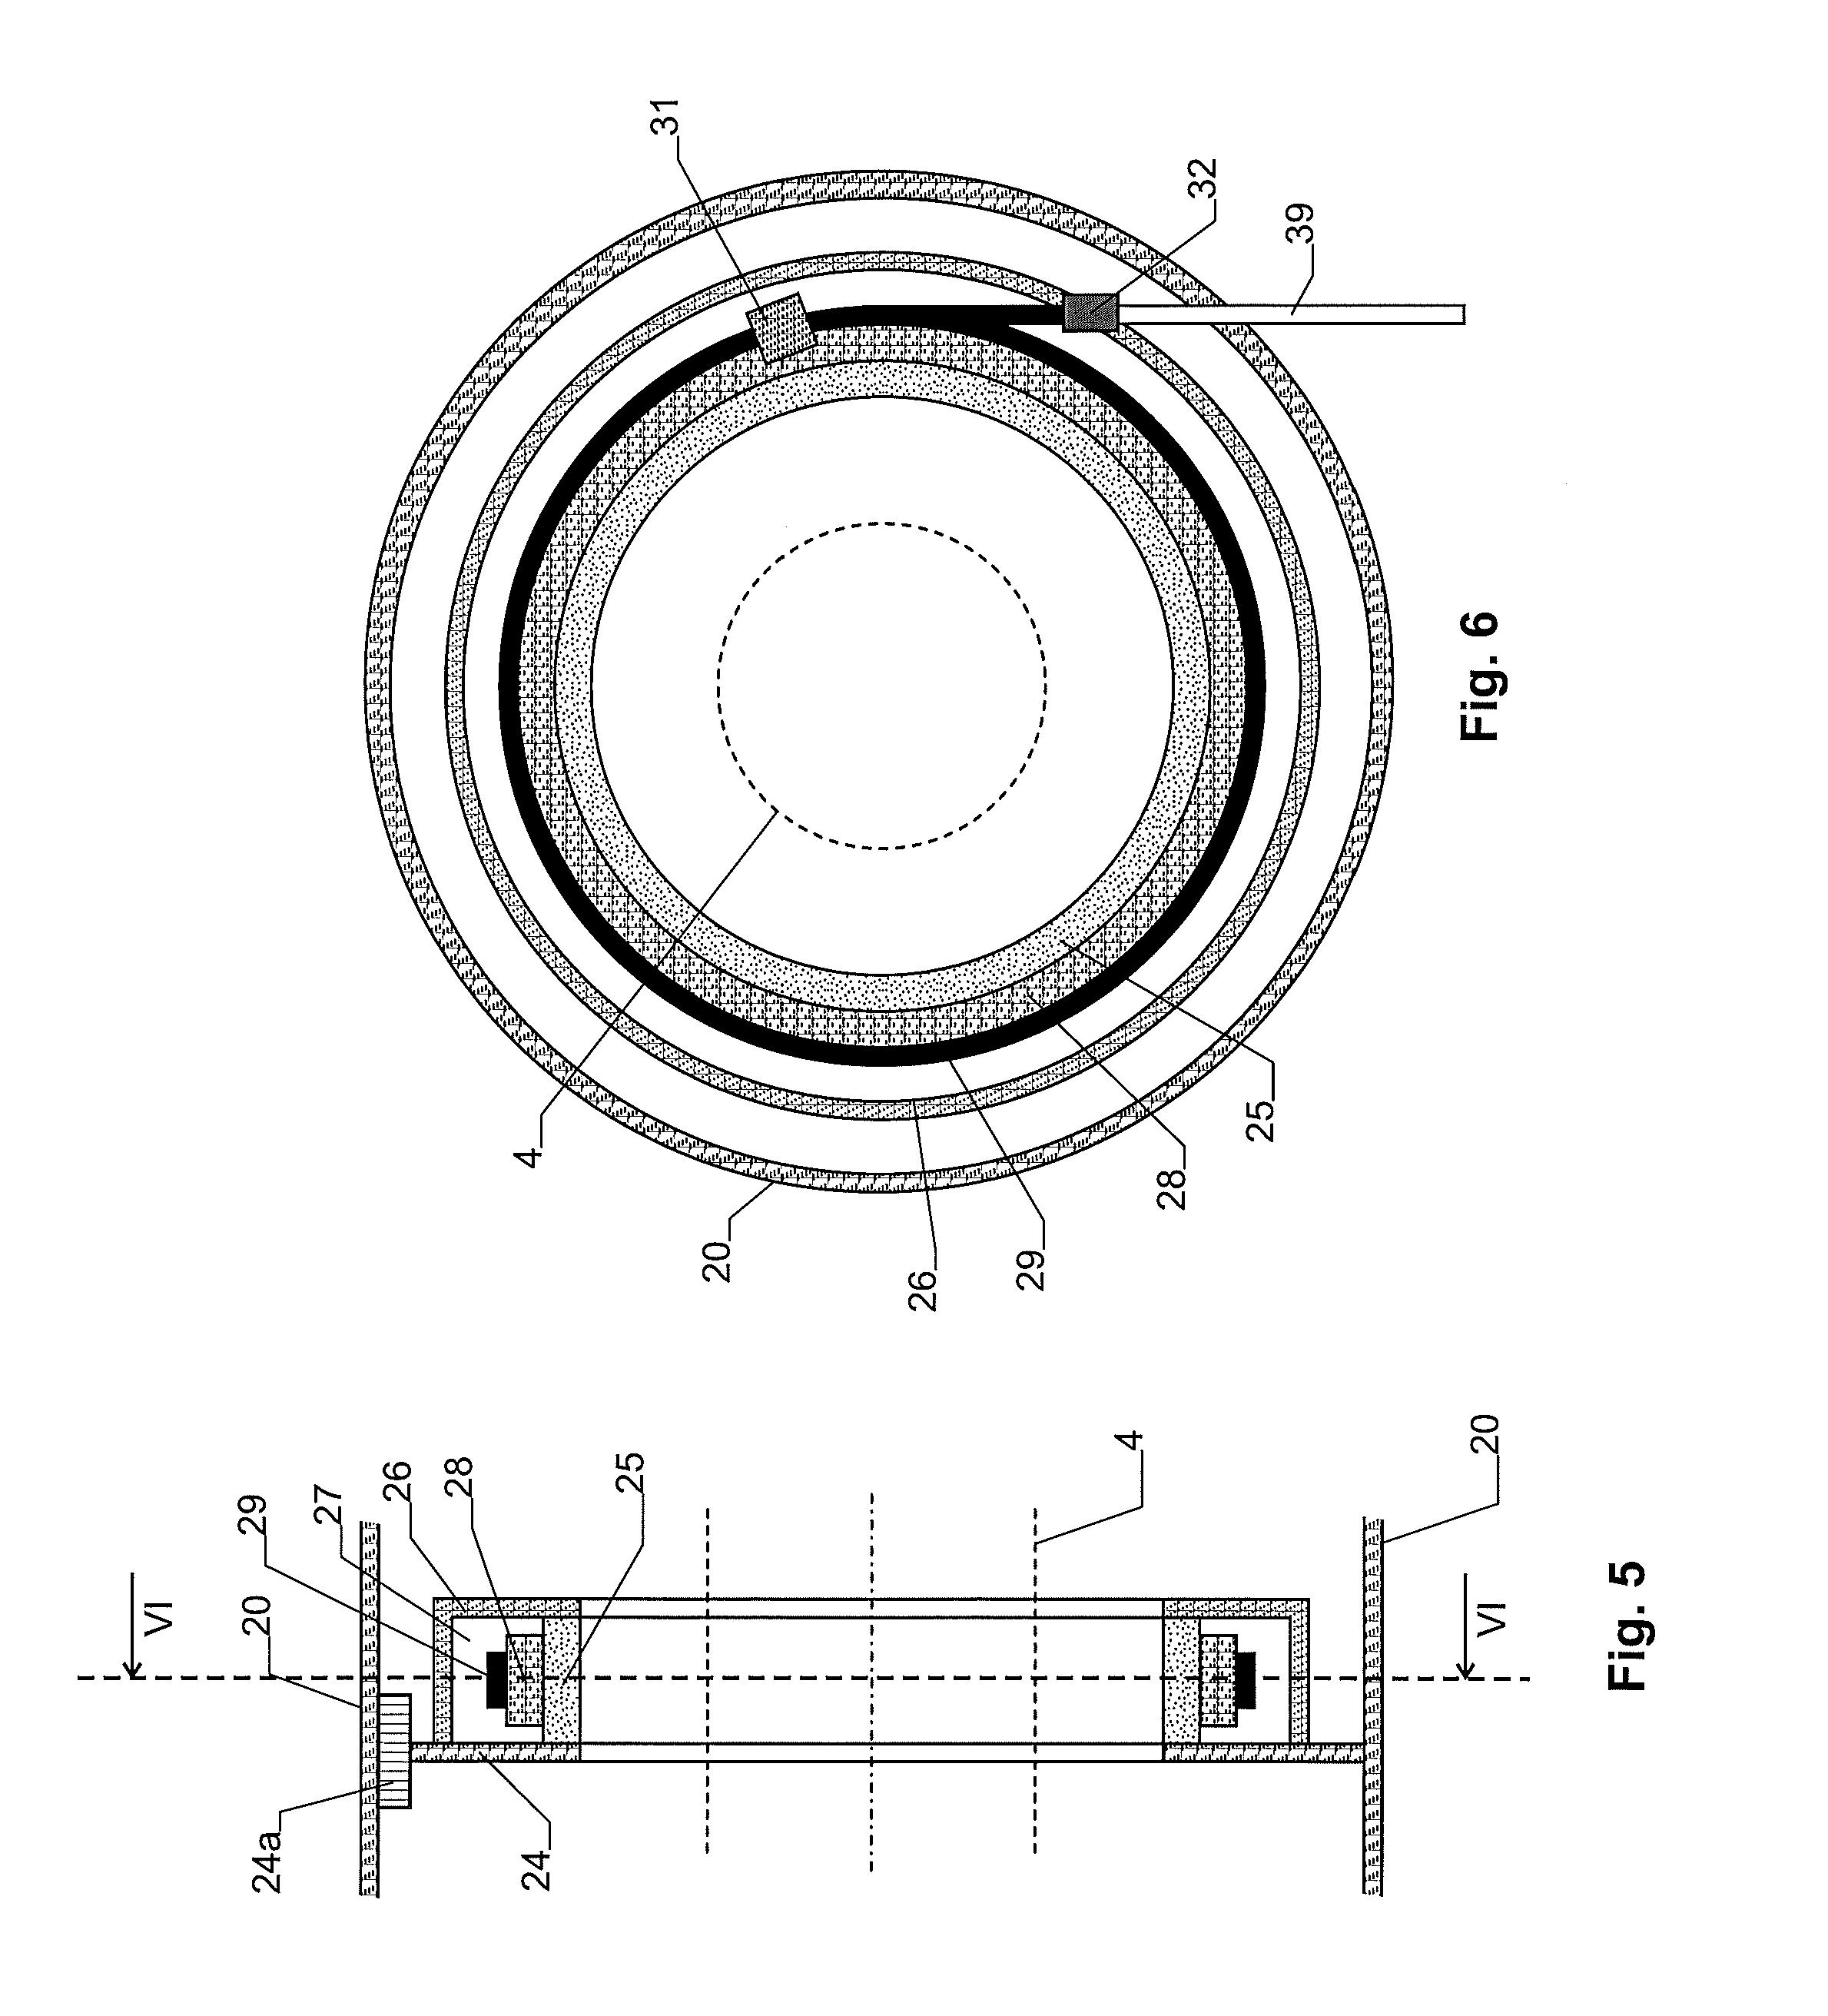 patente us8629672